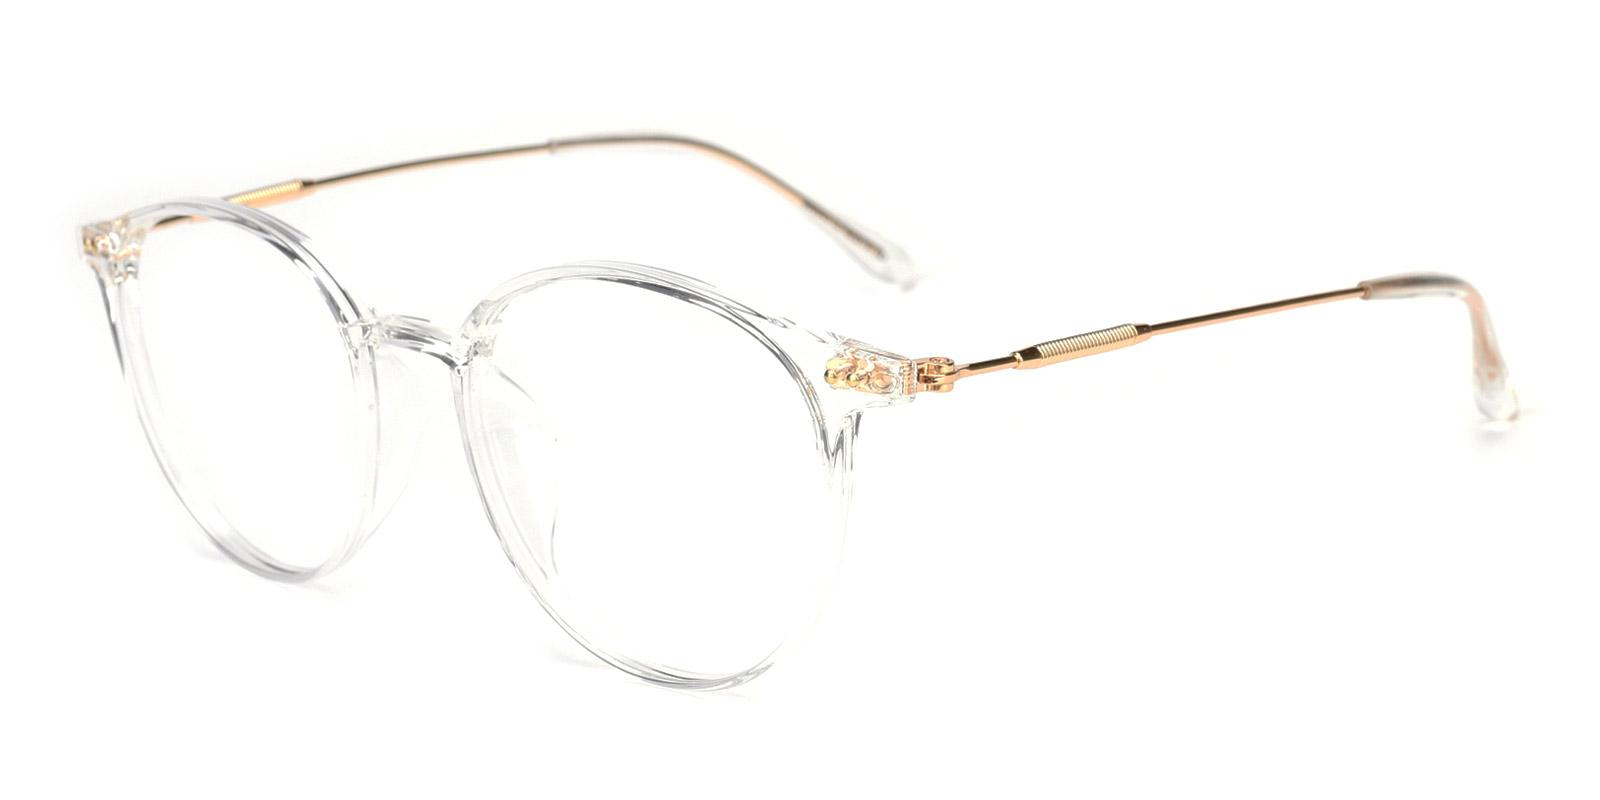 Guardian-Translucent-Round-TR-Eyeglasses-detail